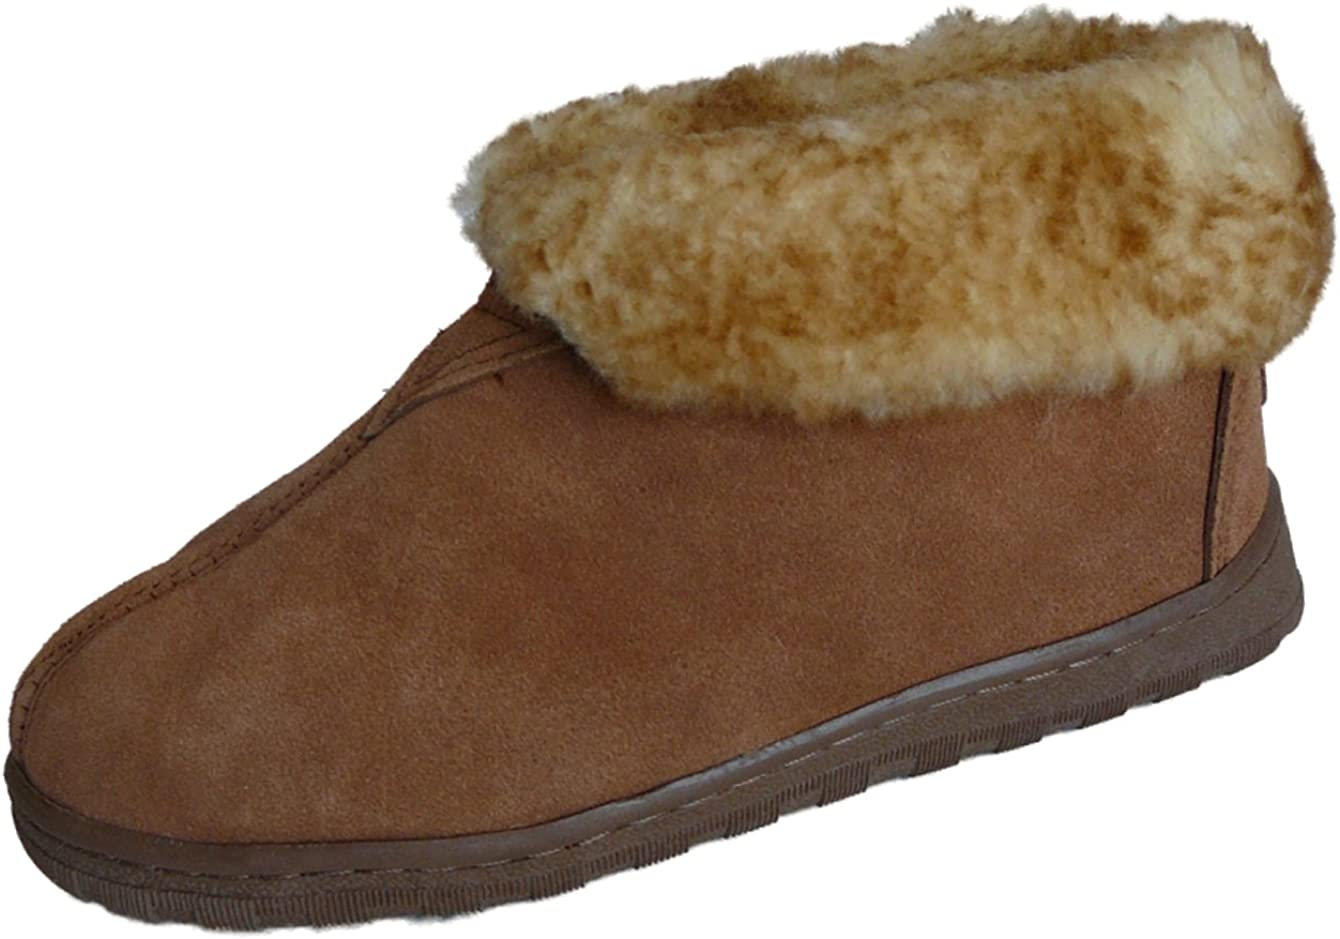 WoolWorks Clearance SALE! Limited time! Model 9-75B Women's Slippers Sheepskin Detroit Mall Australian Sued